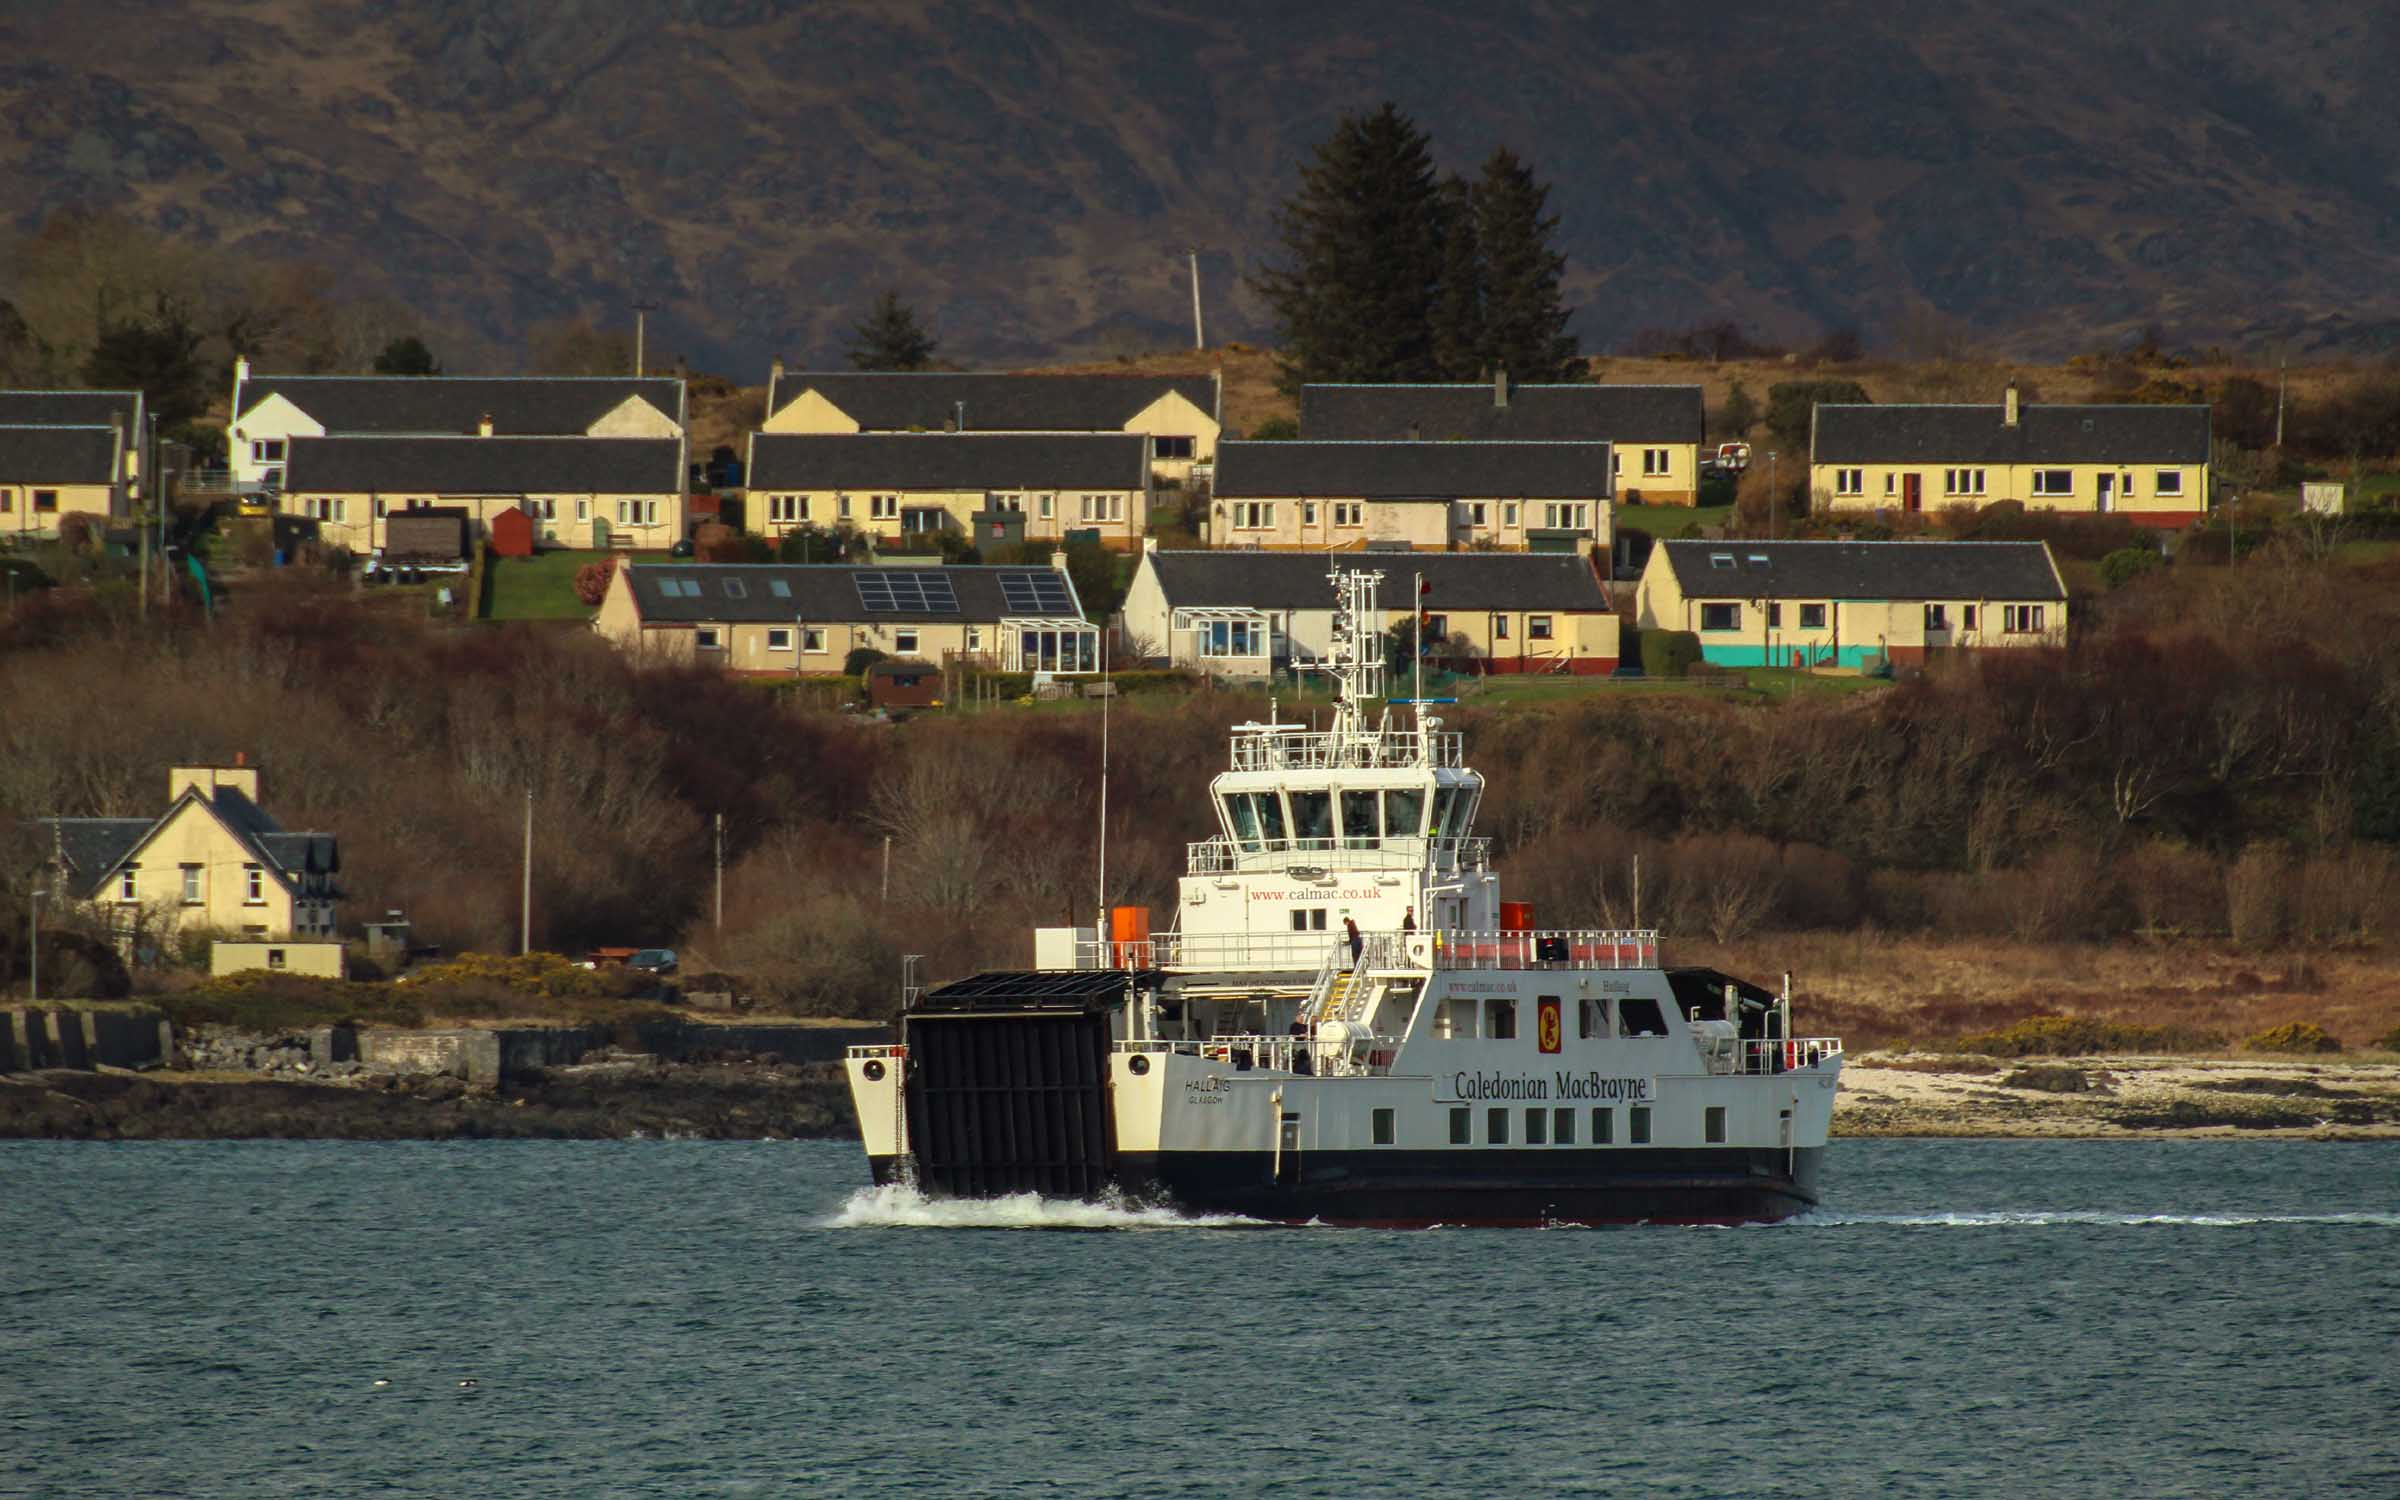 Hallaig relieving on the Lochaline - Fishnish run (Ships of CalMac)